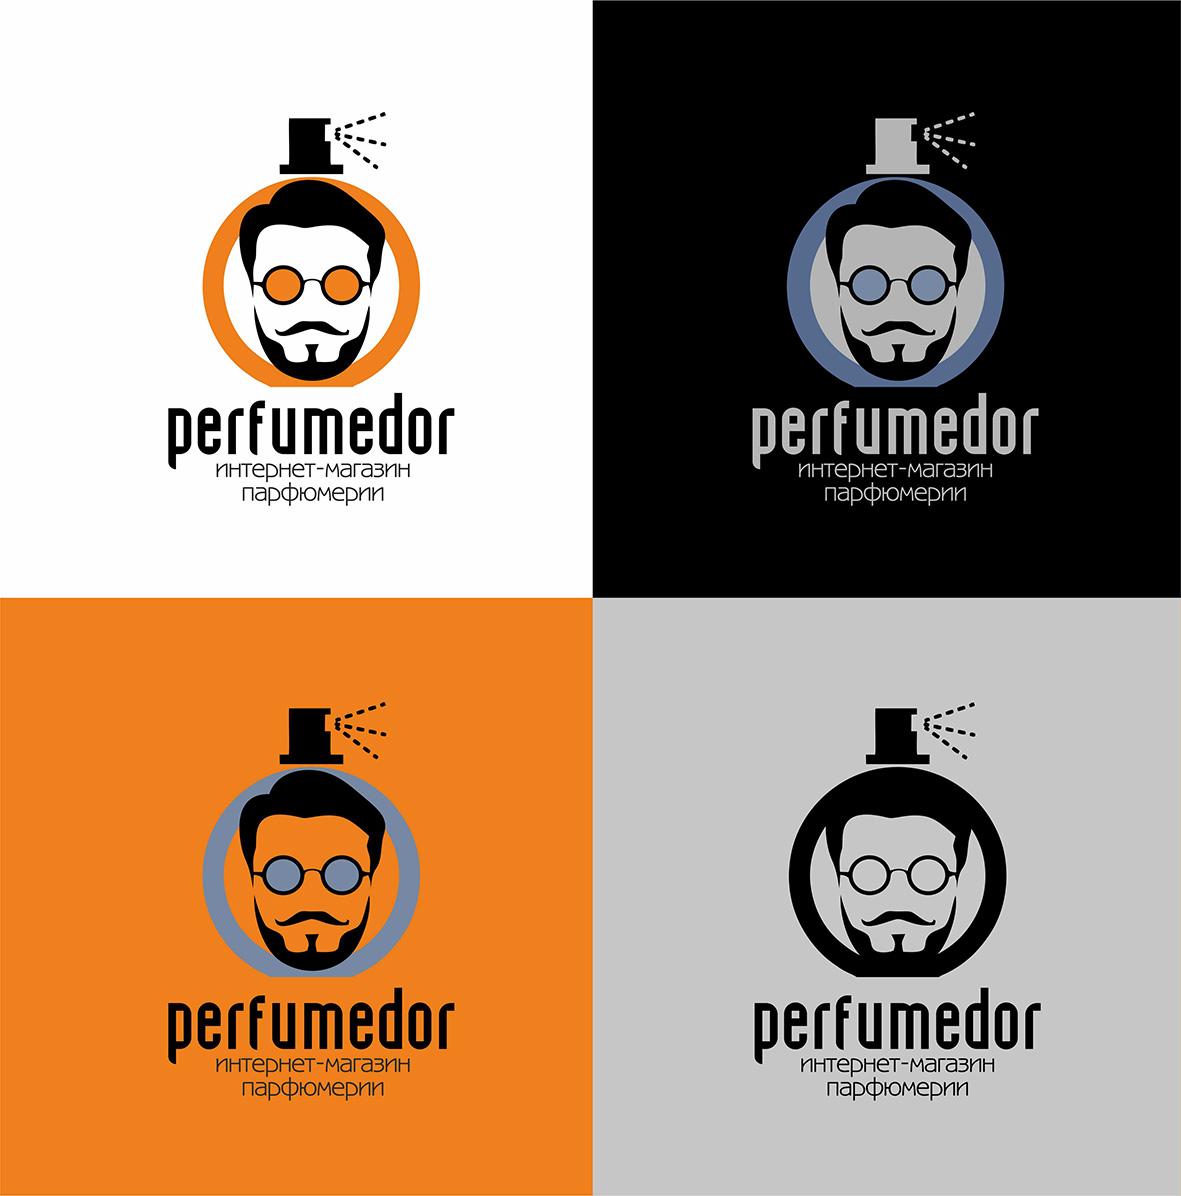 Логотип для интернет-магазина парфюмерии фото f_1765b44c168f202b.jpg